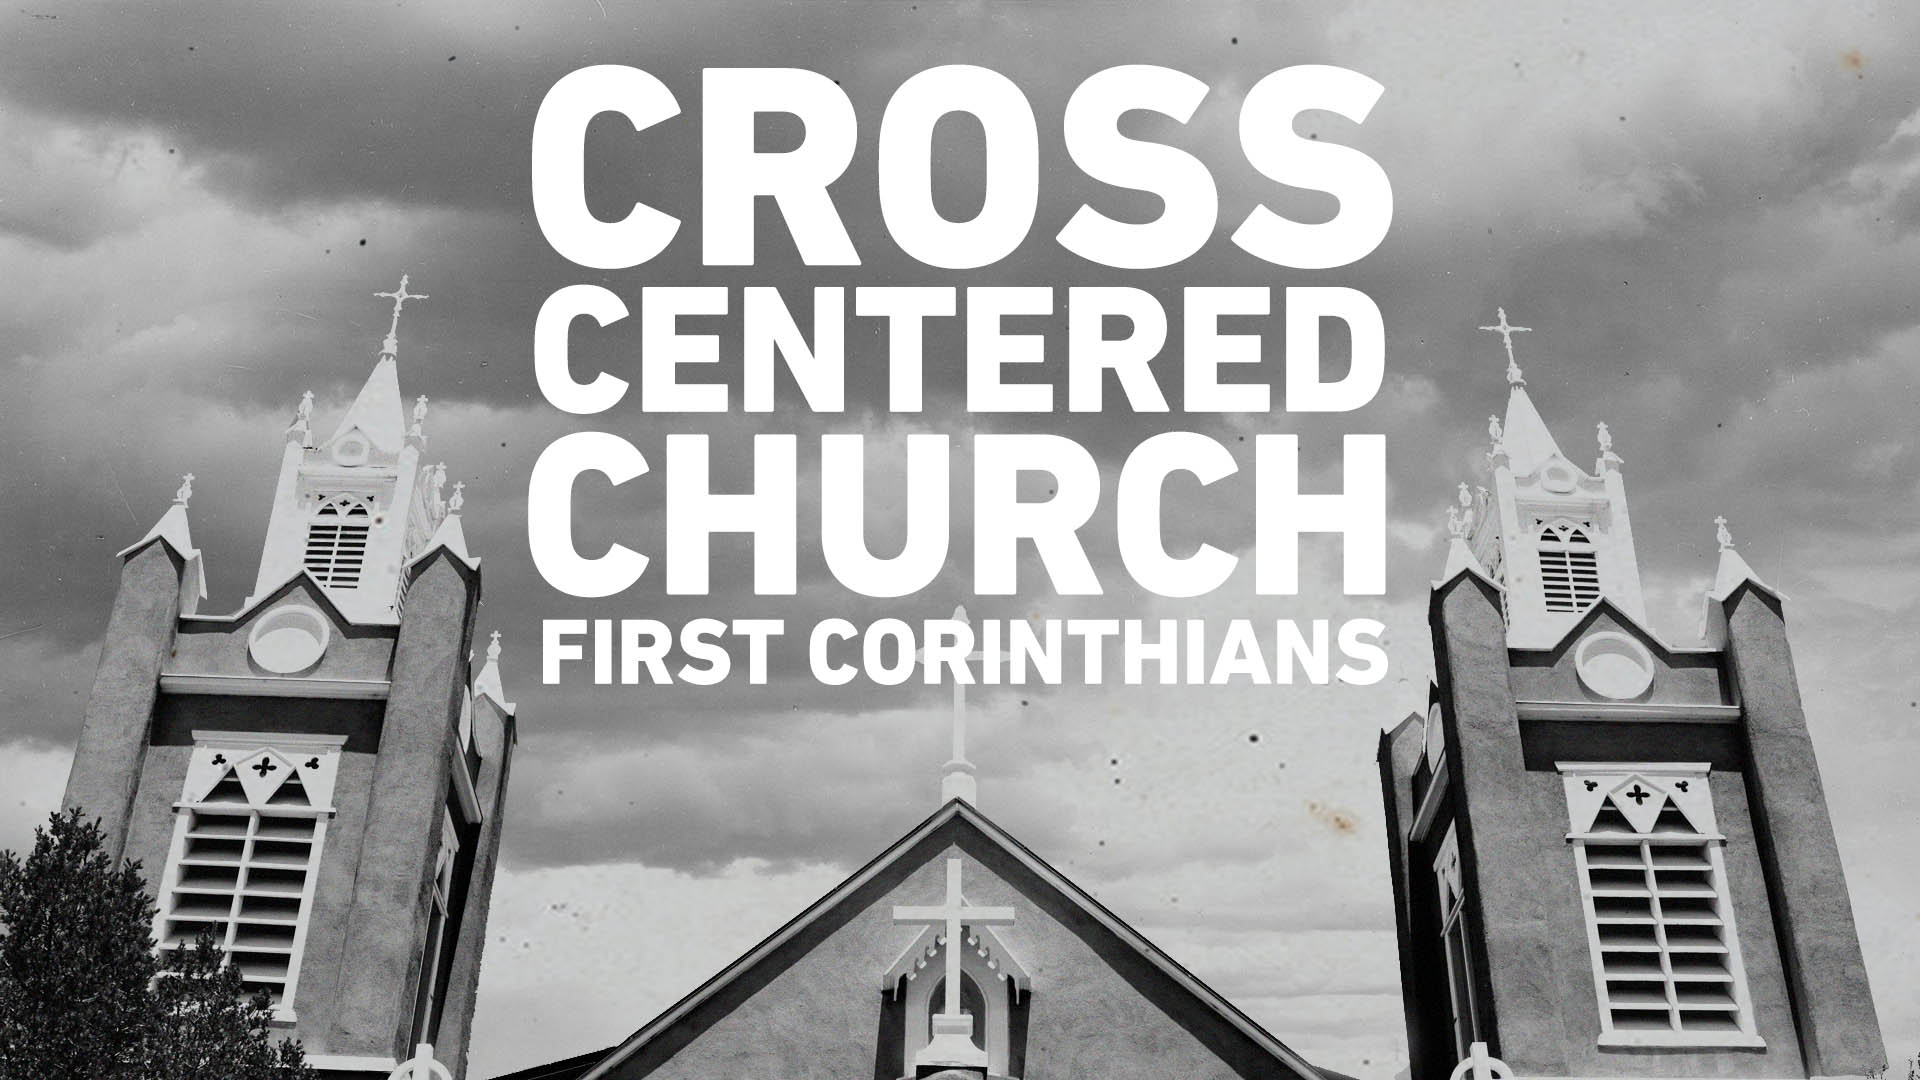 Cross Centered Church.jpg